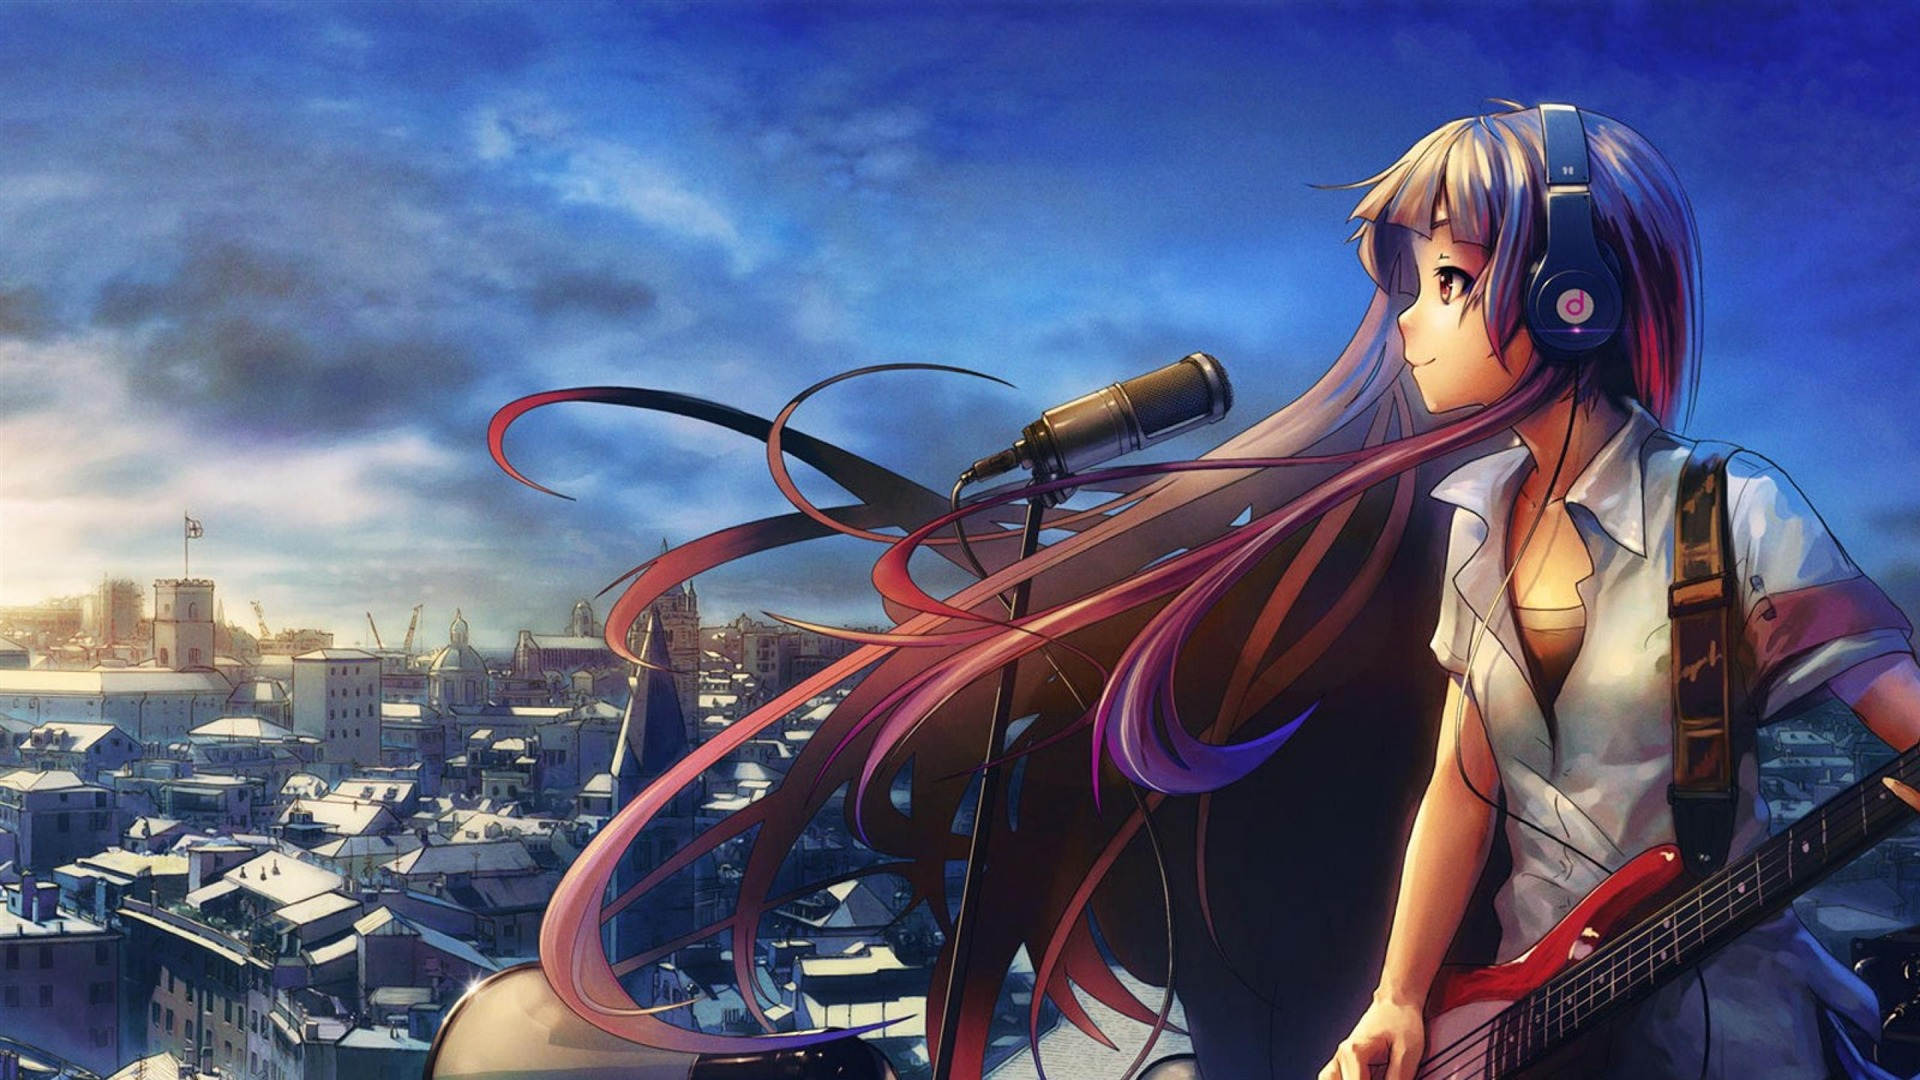 100 Wallpapers de anime HD Girl_Guitar_Music-Anime_design_HD_wallpaper_1920x1080